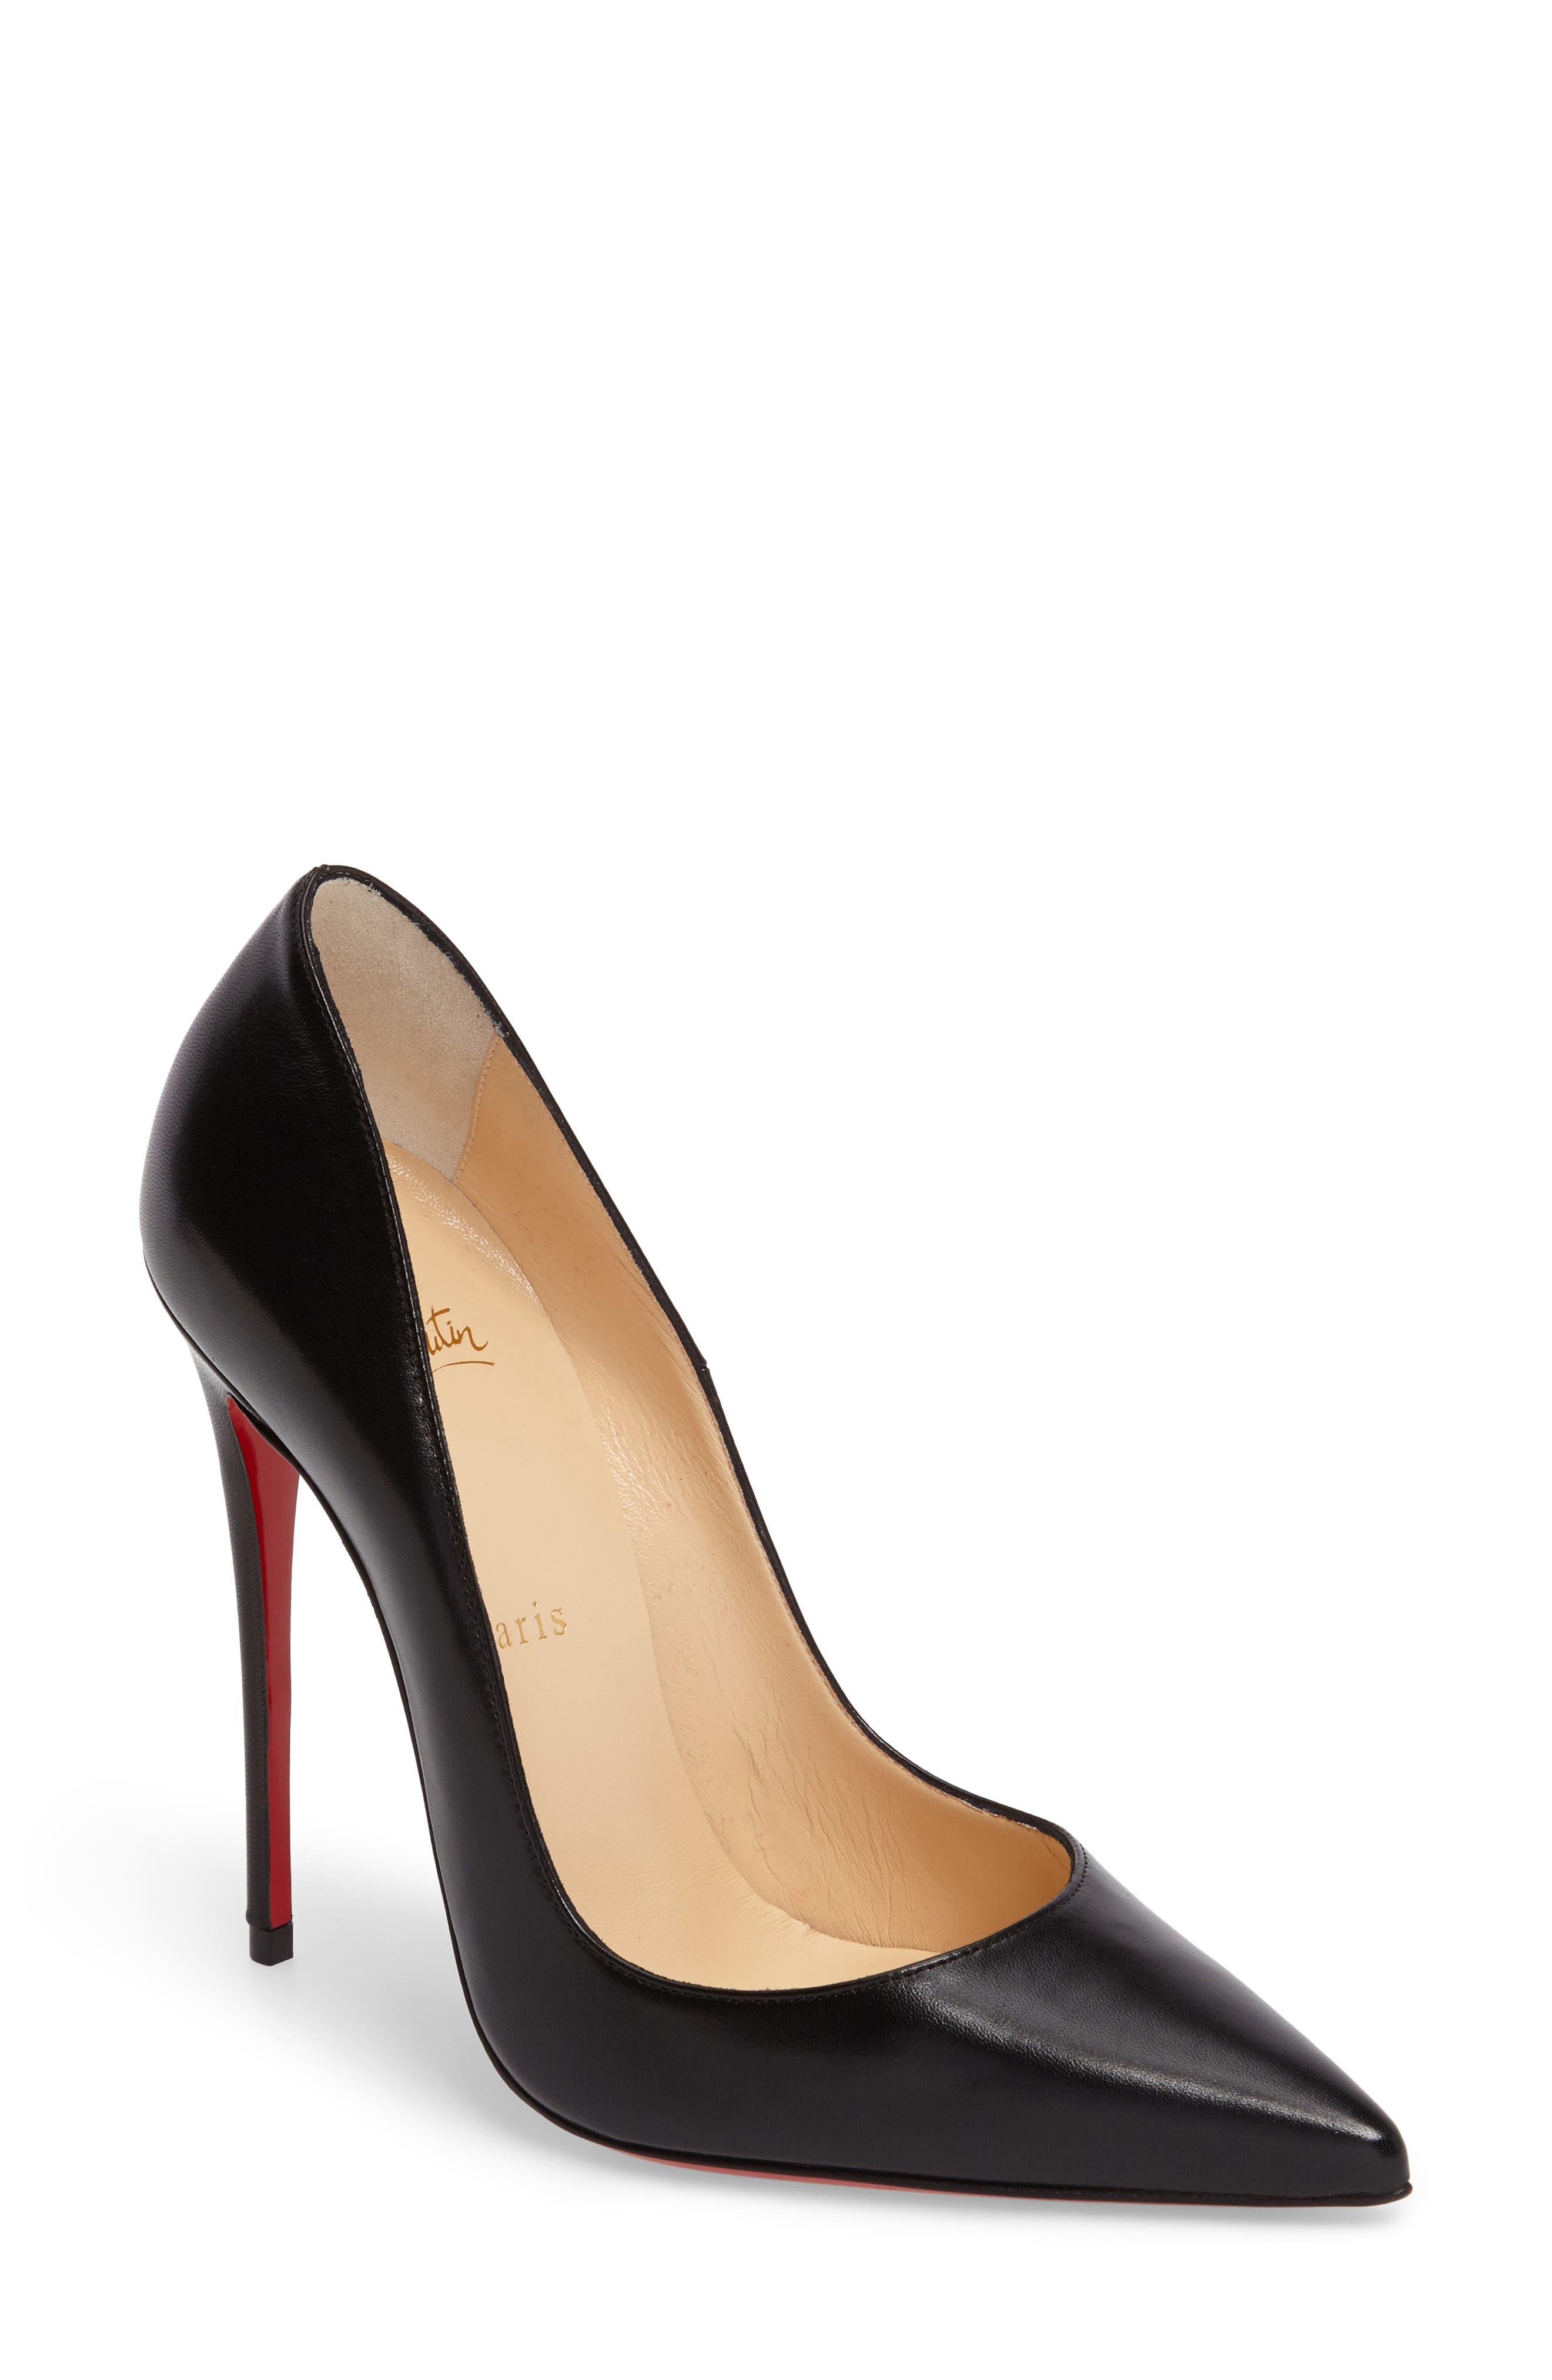 christian louboutin classic high heels